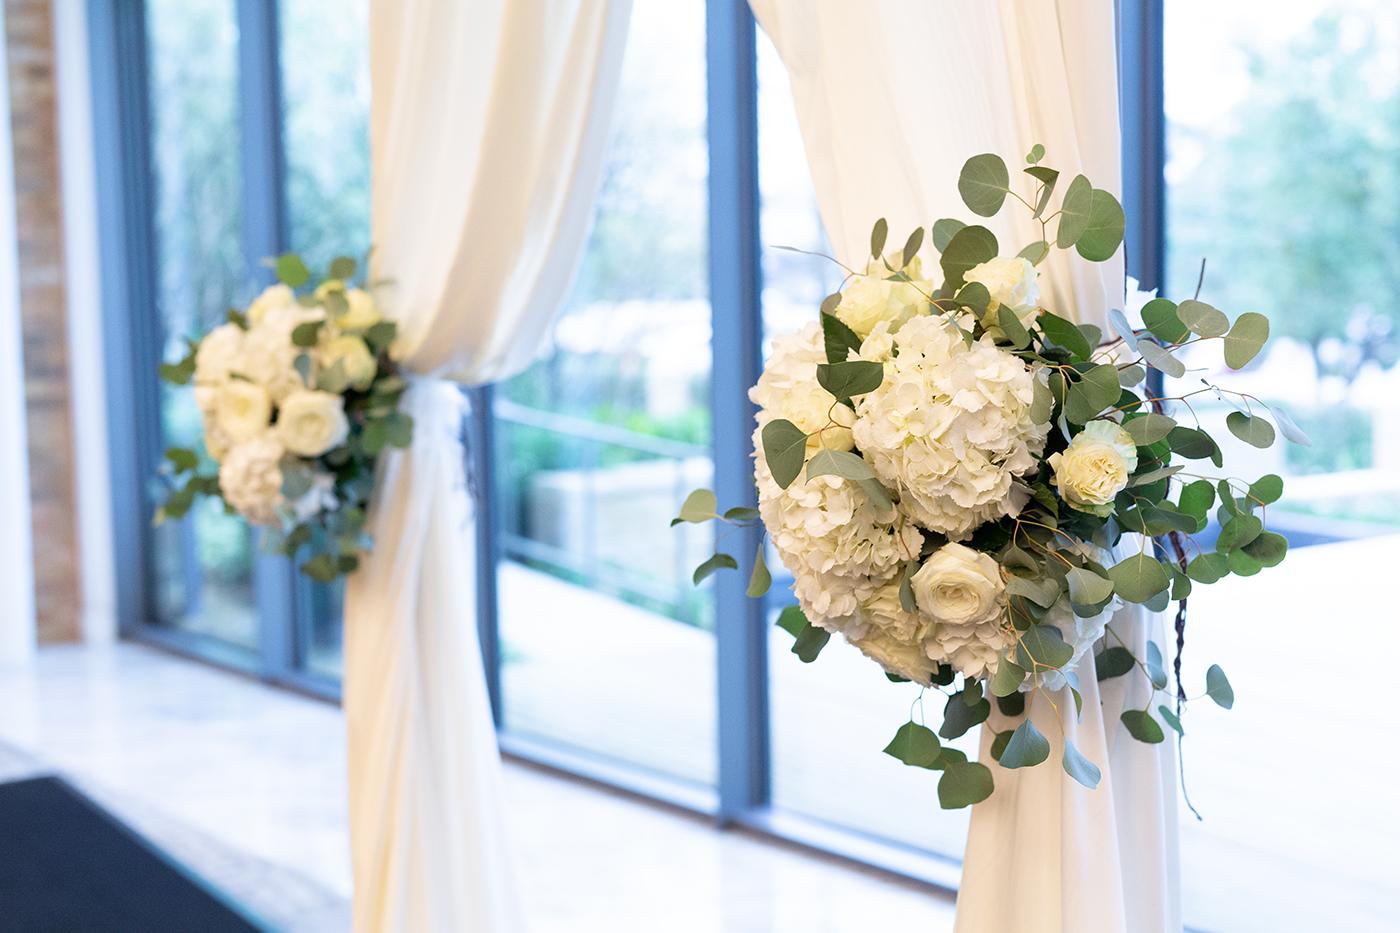 DFW Wedding Planner - Caroline + Jeff at The Four Seasons Hotel Wedding - Allday Events - 78.jpg